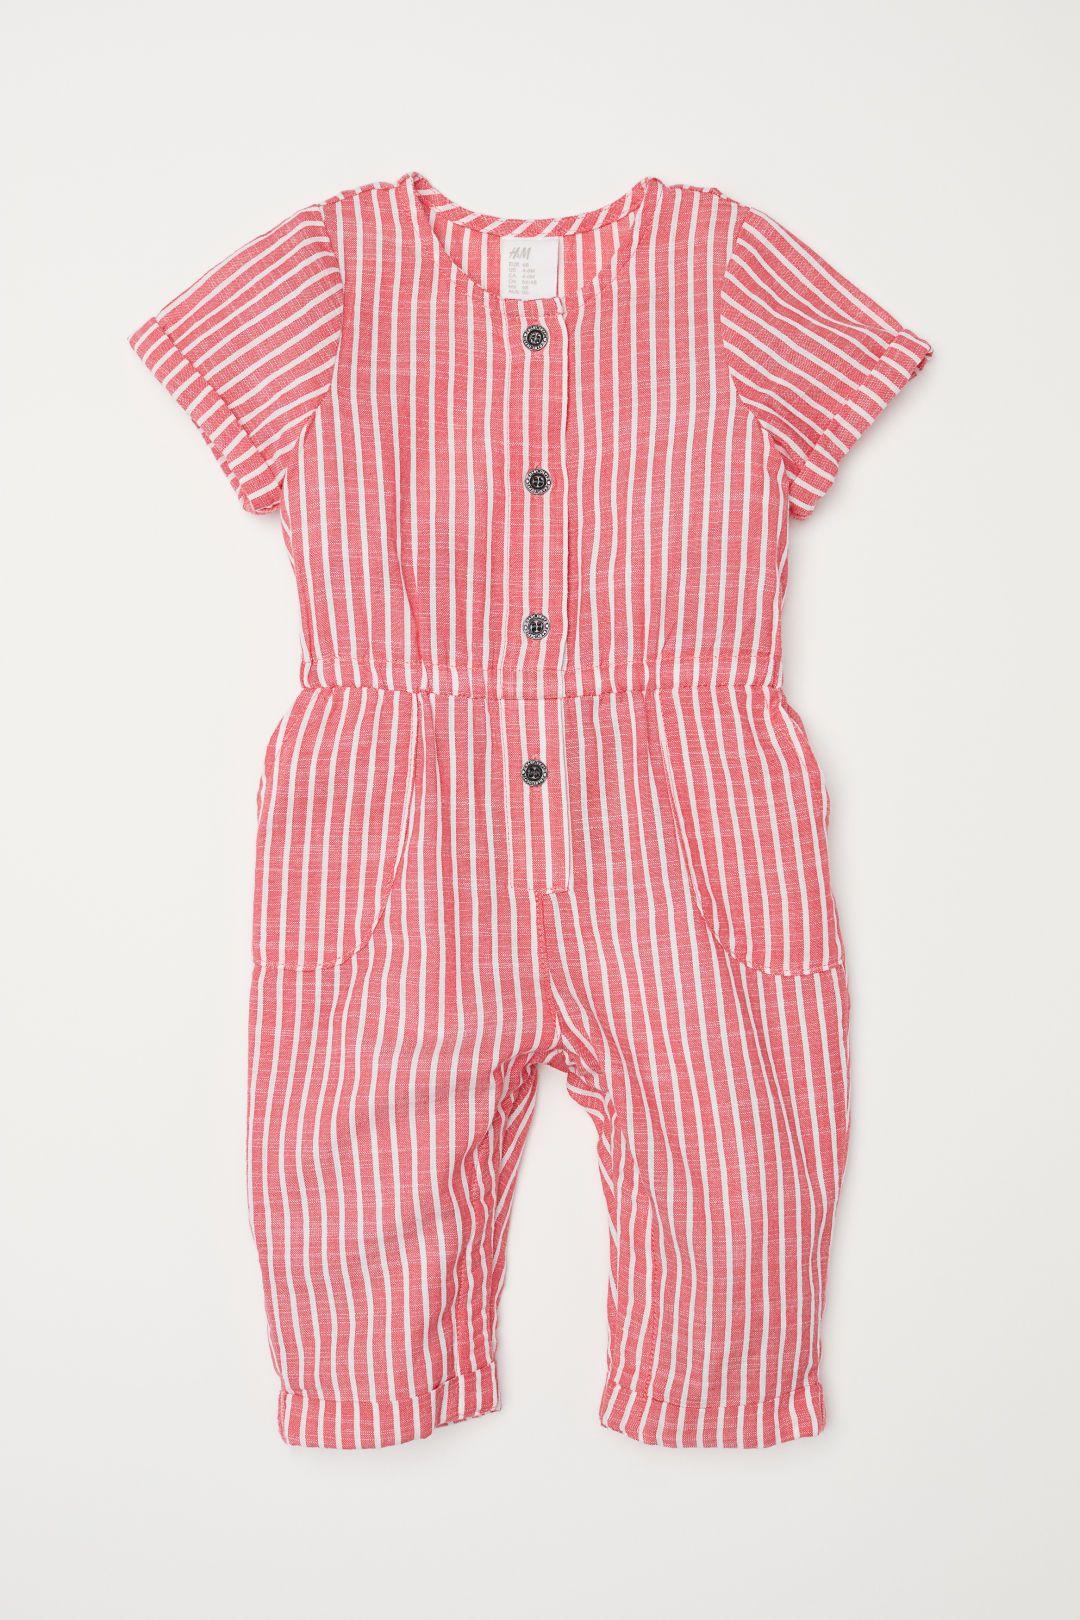 2b38e7be58 Short-sleeved romper suit - Red White striped - Kids